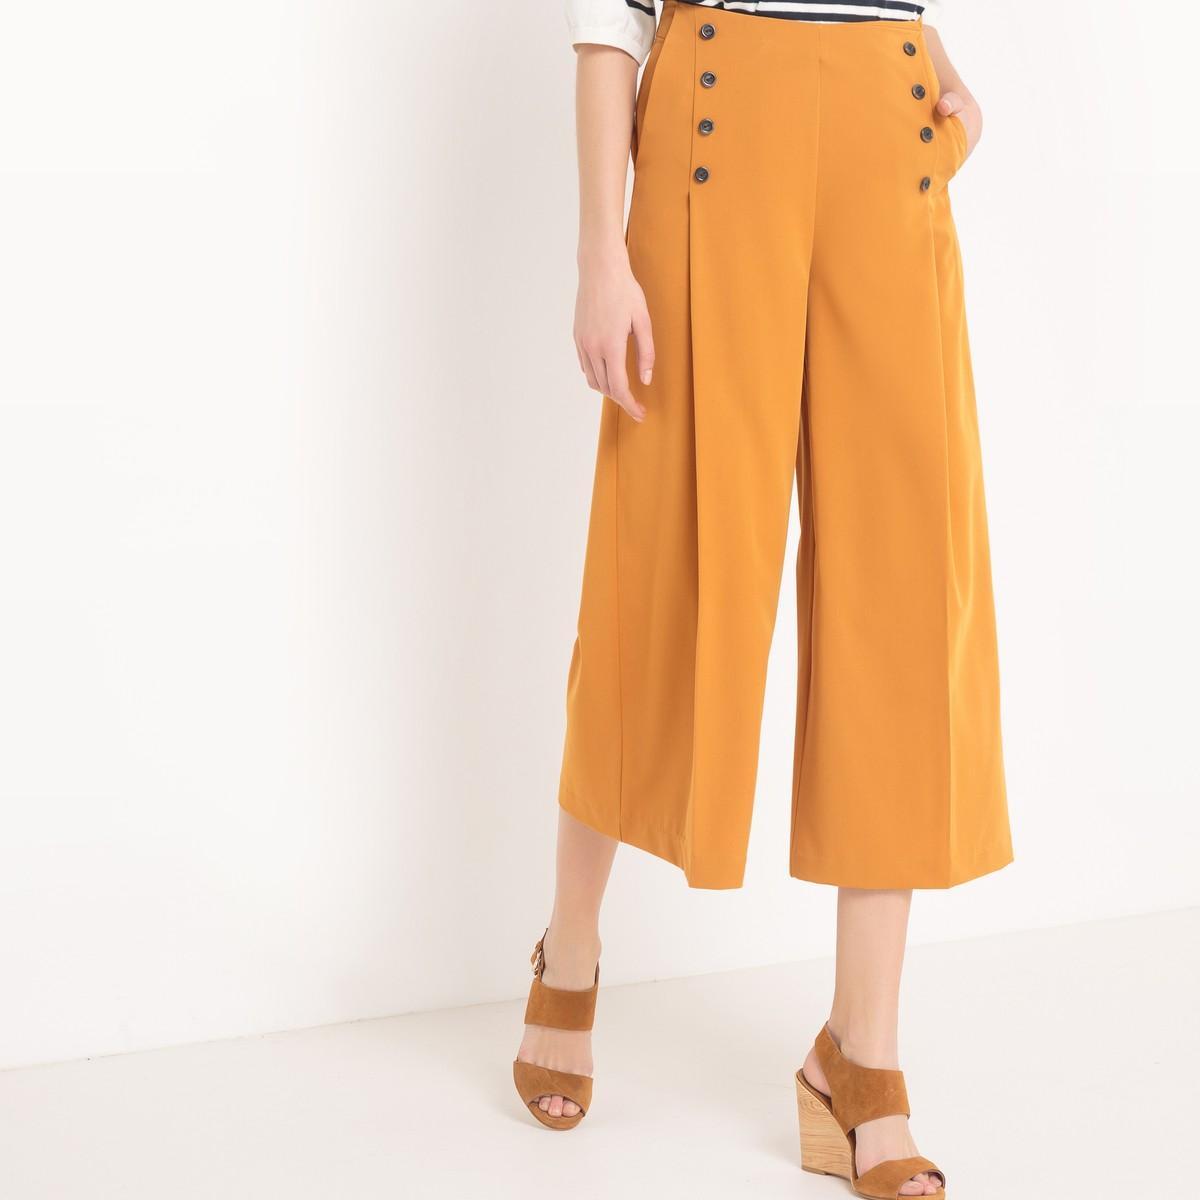 lyst la redoute jupe culotte in orange. Black Bedroom Furniture Sets. Home Design Ideas